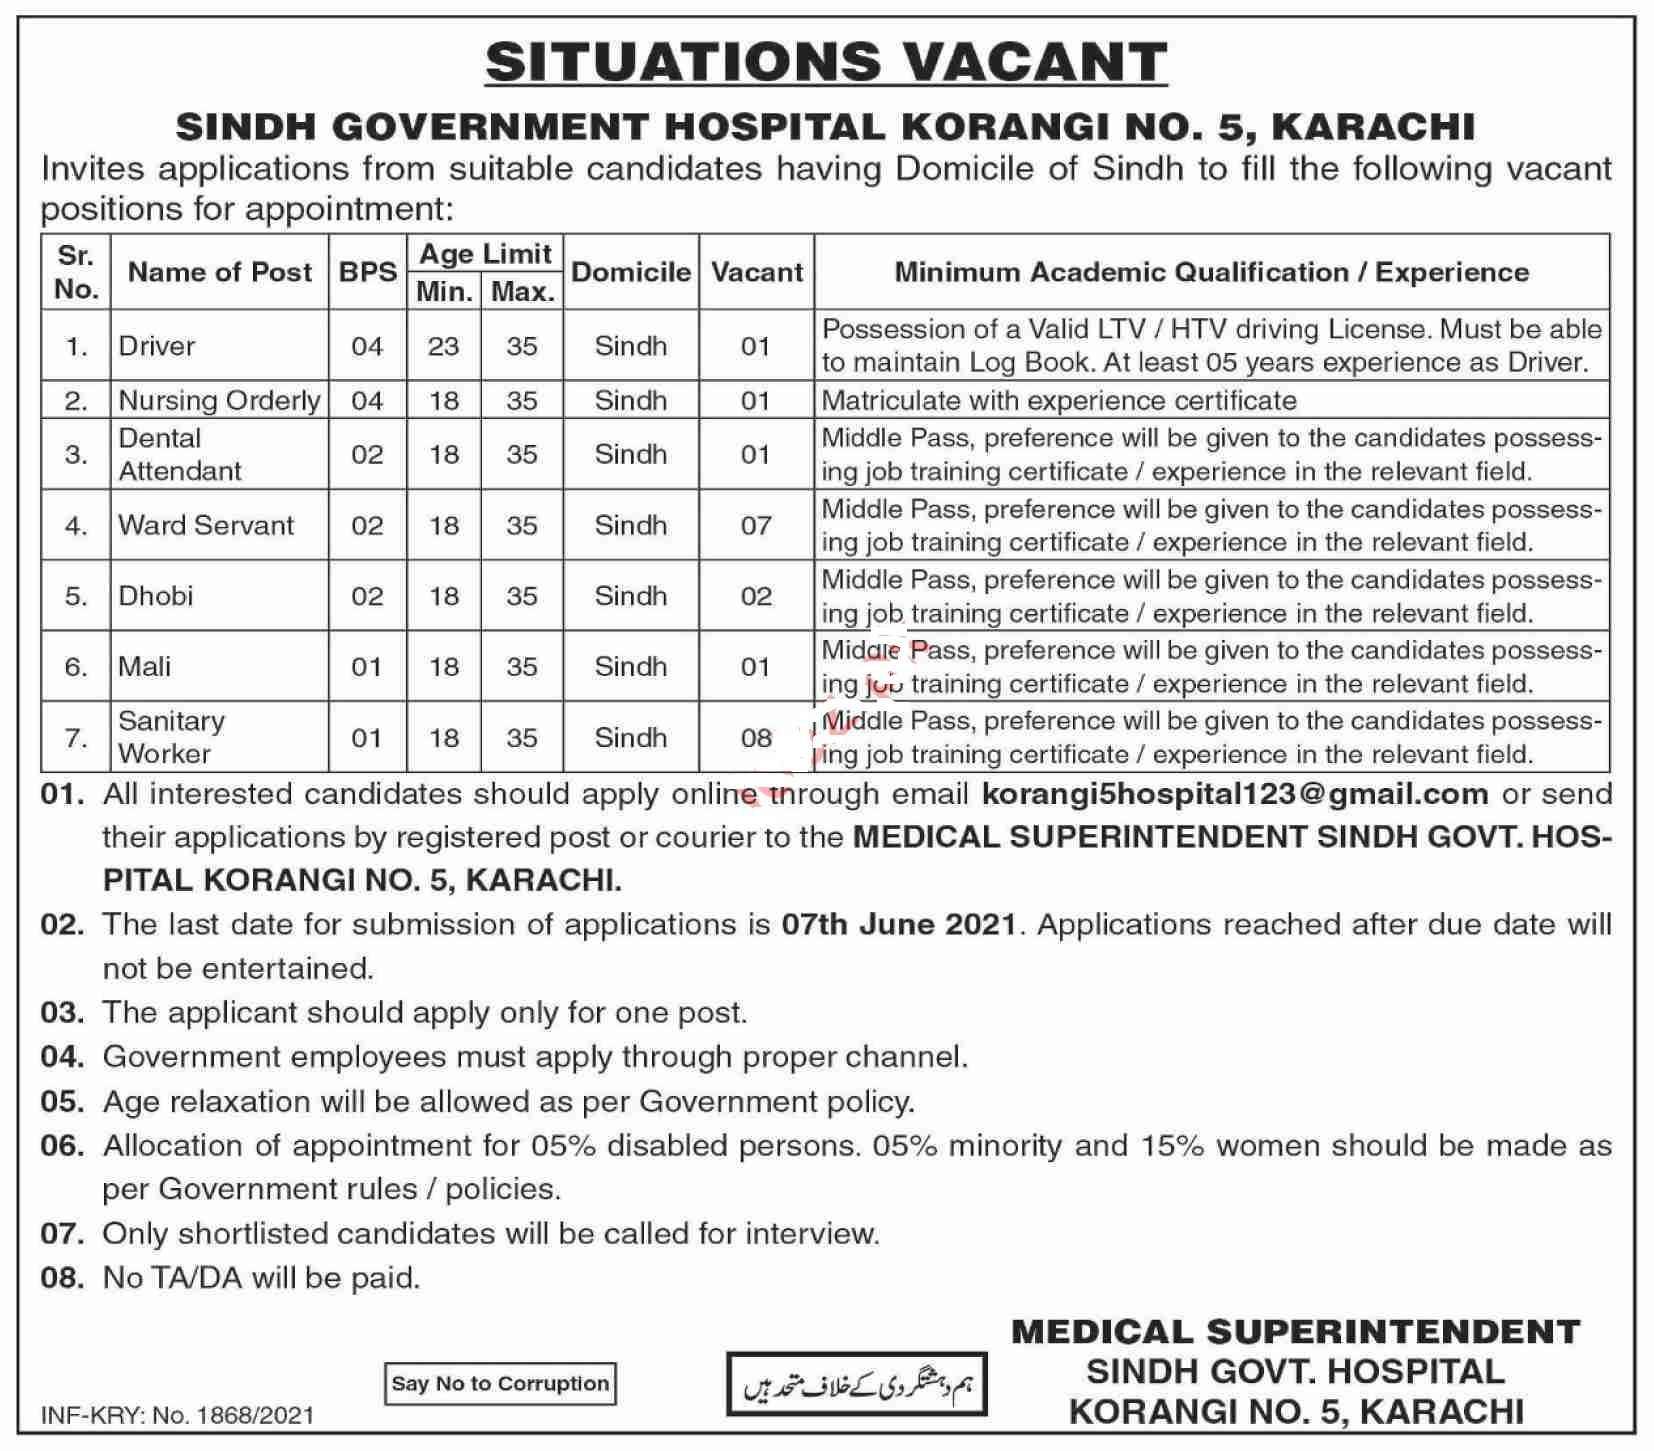 Latest Sindh Government Hospital Korangi No 5 Karachi Jobs 2021